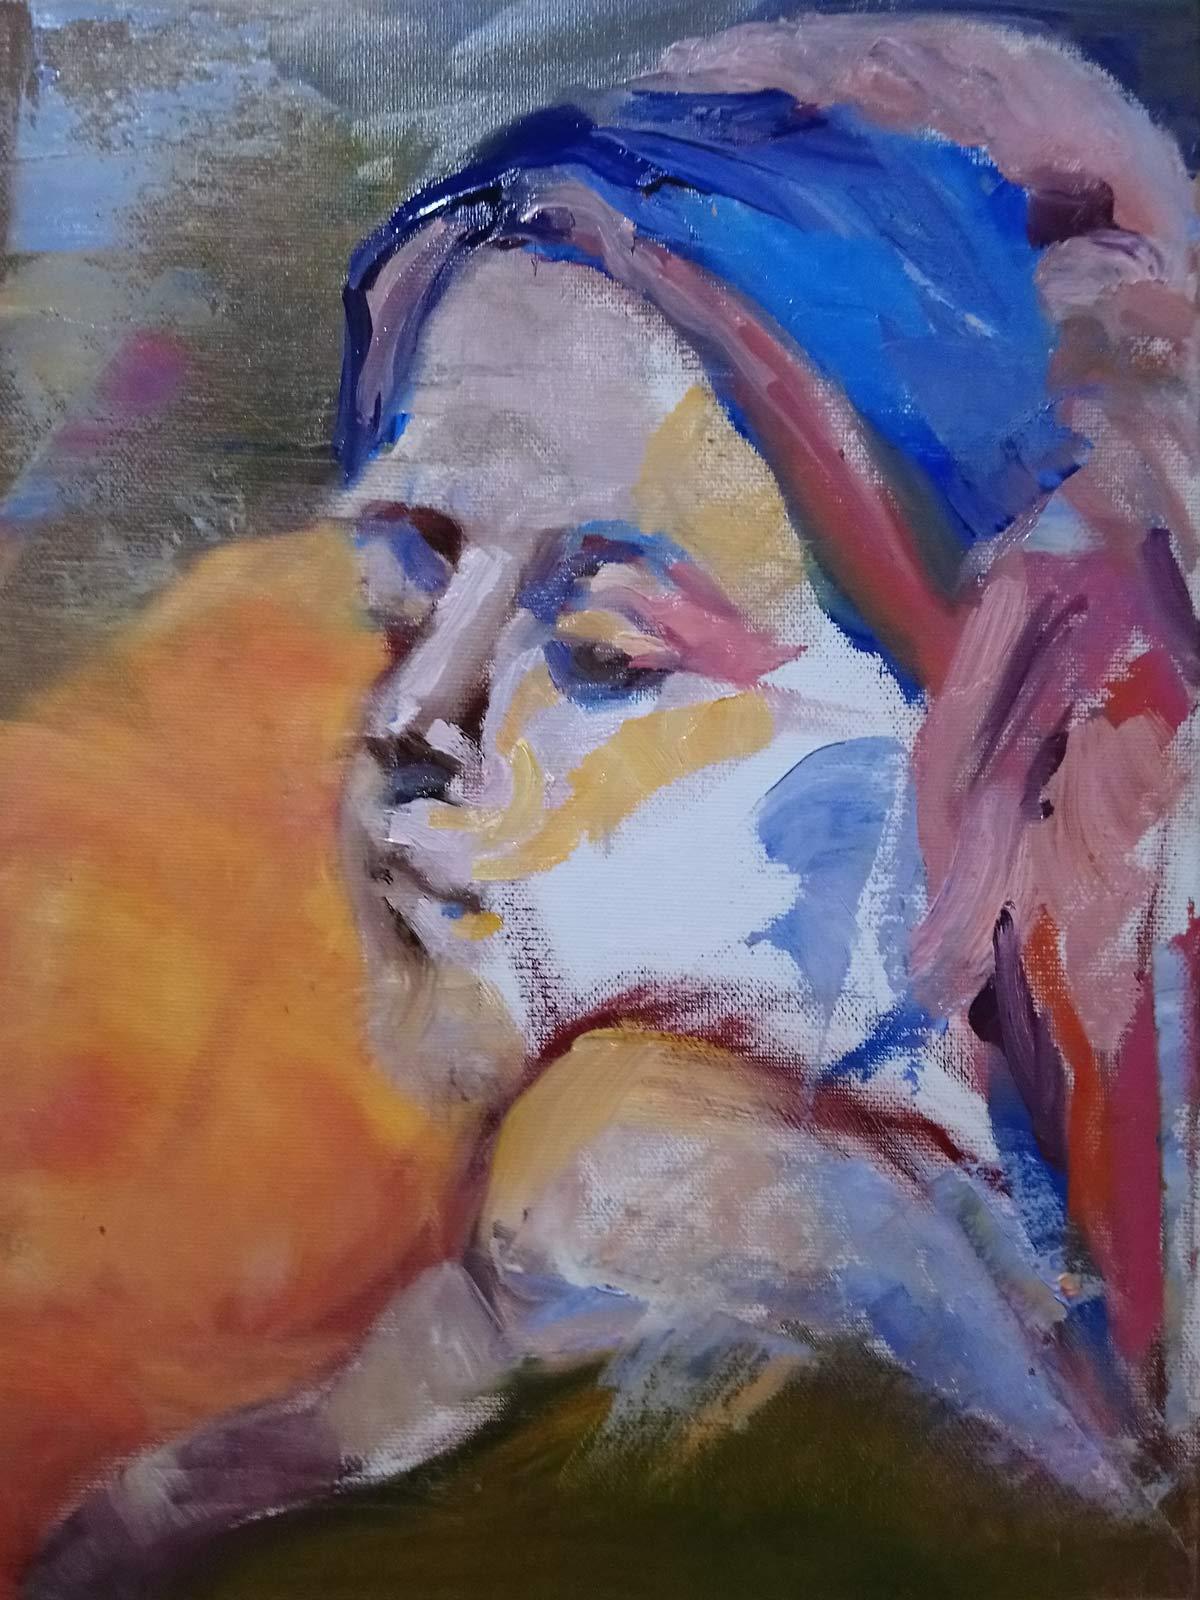 untitled bust 1 by cornelia es said 2021, oil on canvas, 30x40 cm es said